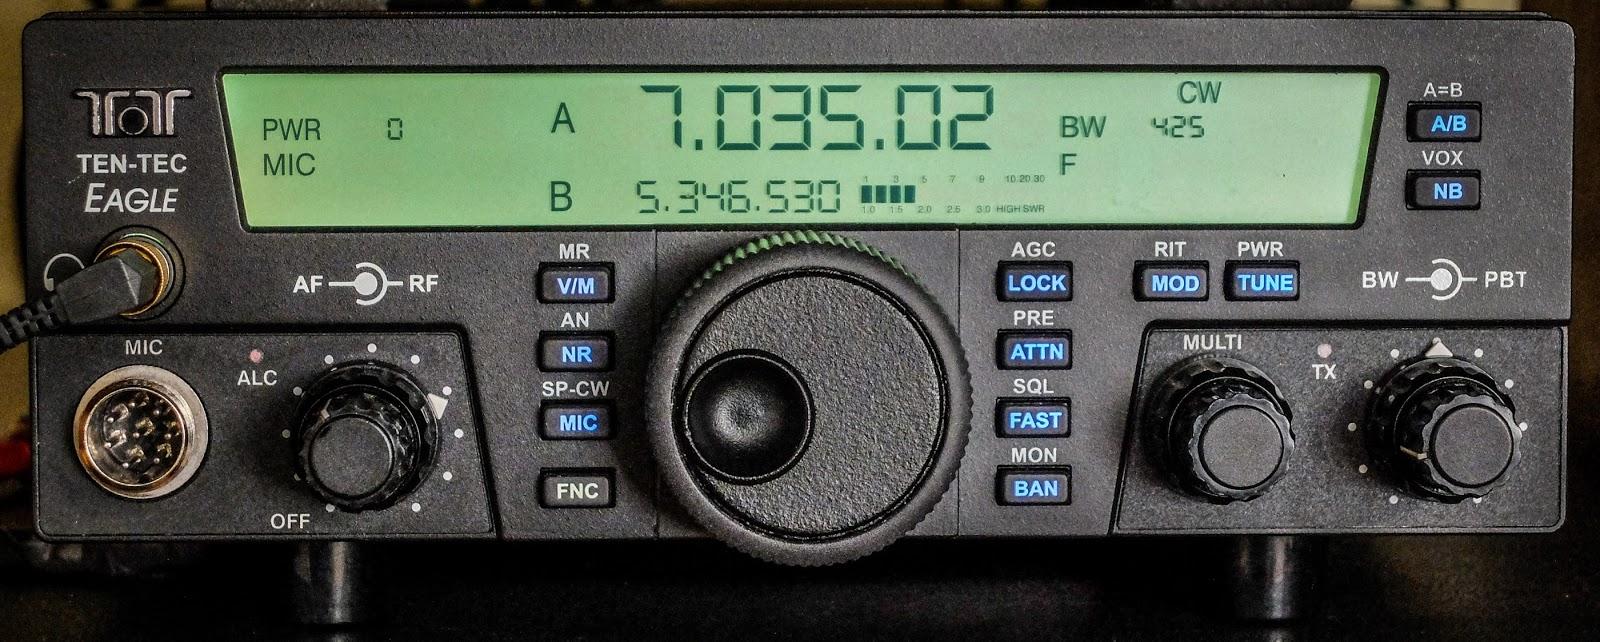 Ham Radio - QRP: My TenTec Eagle sounds better than my